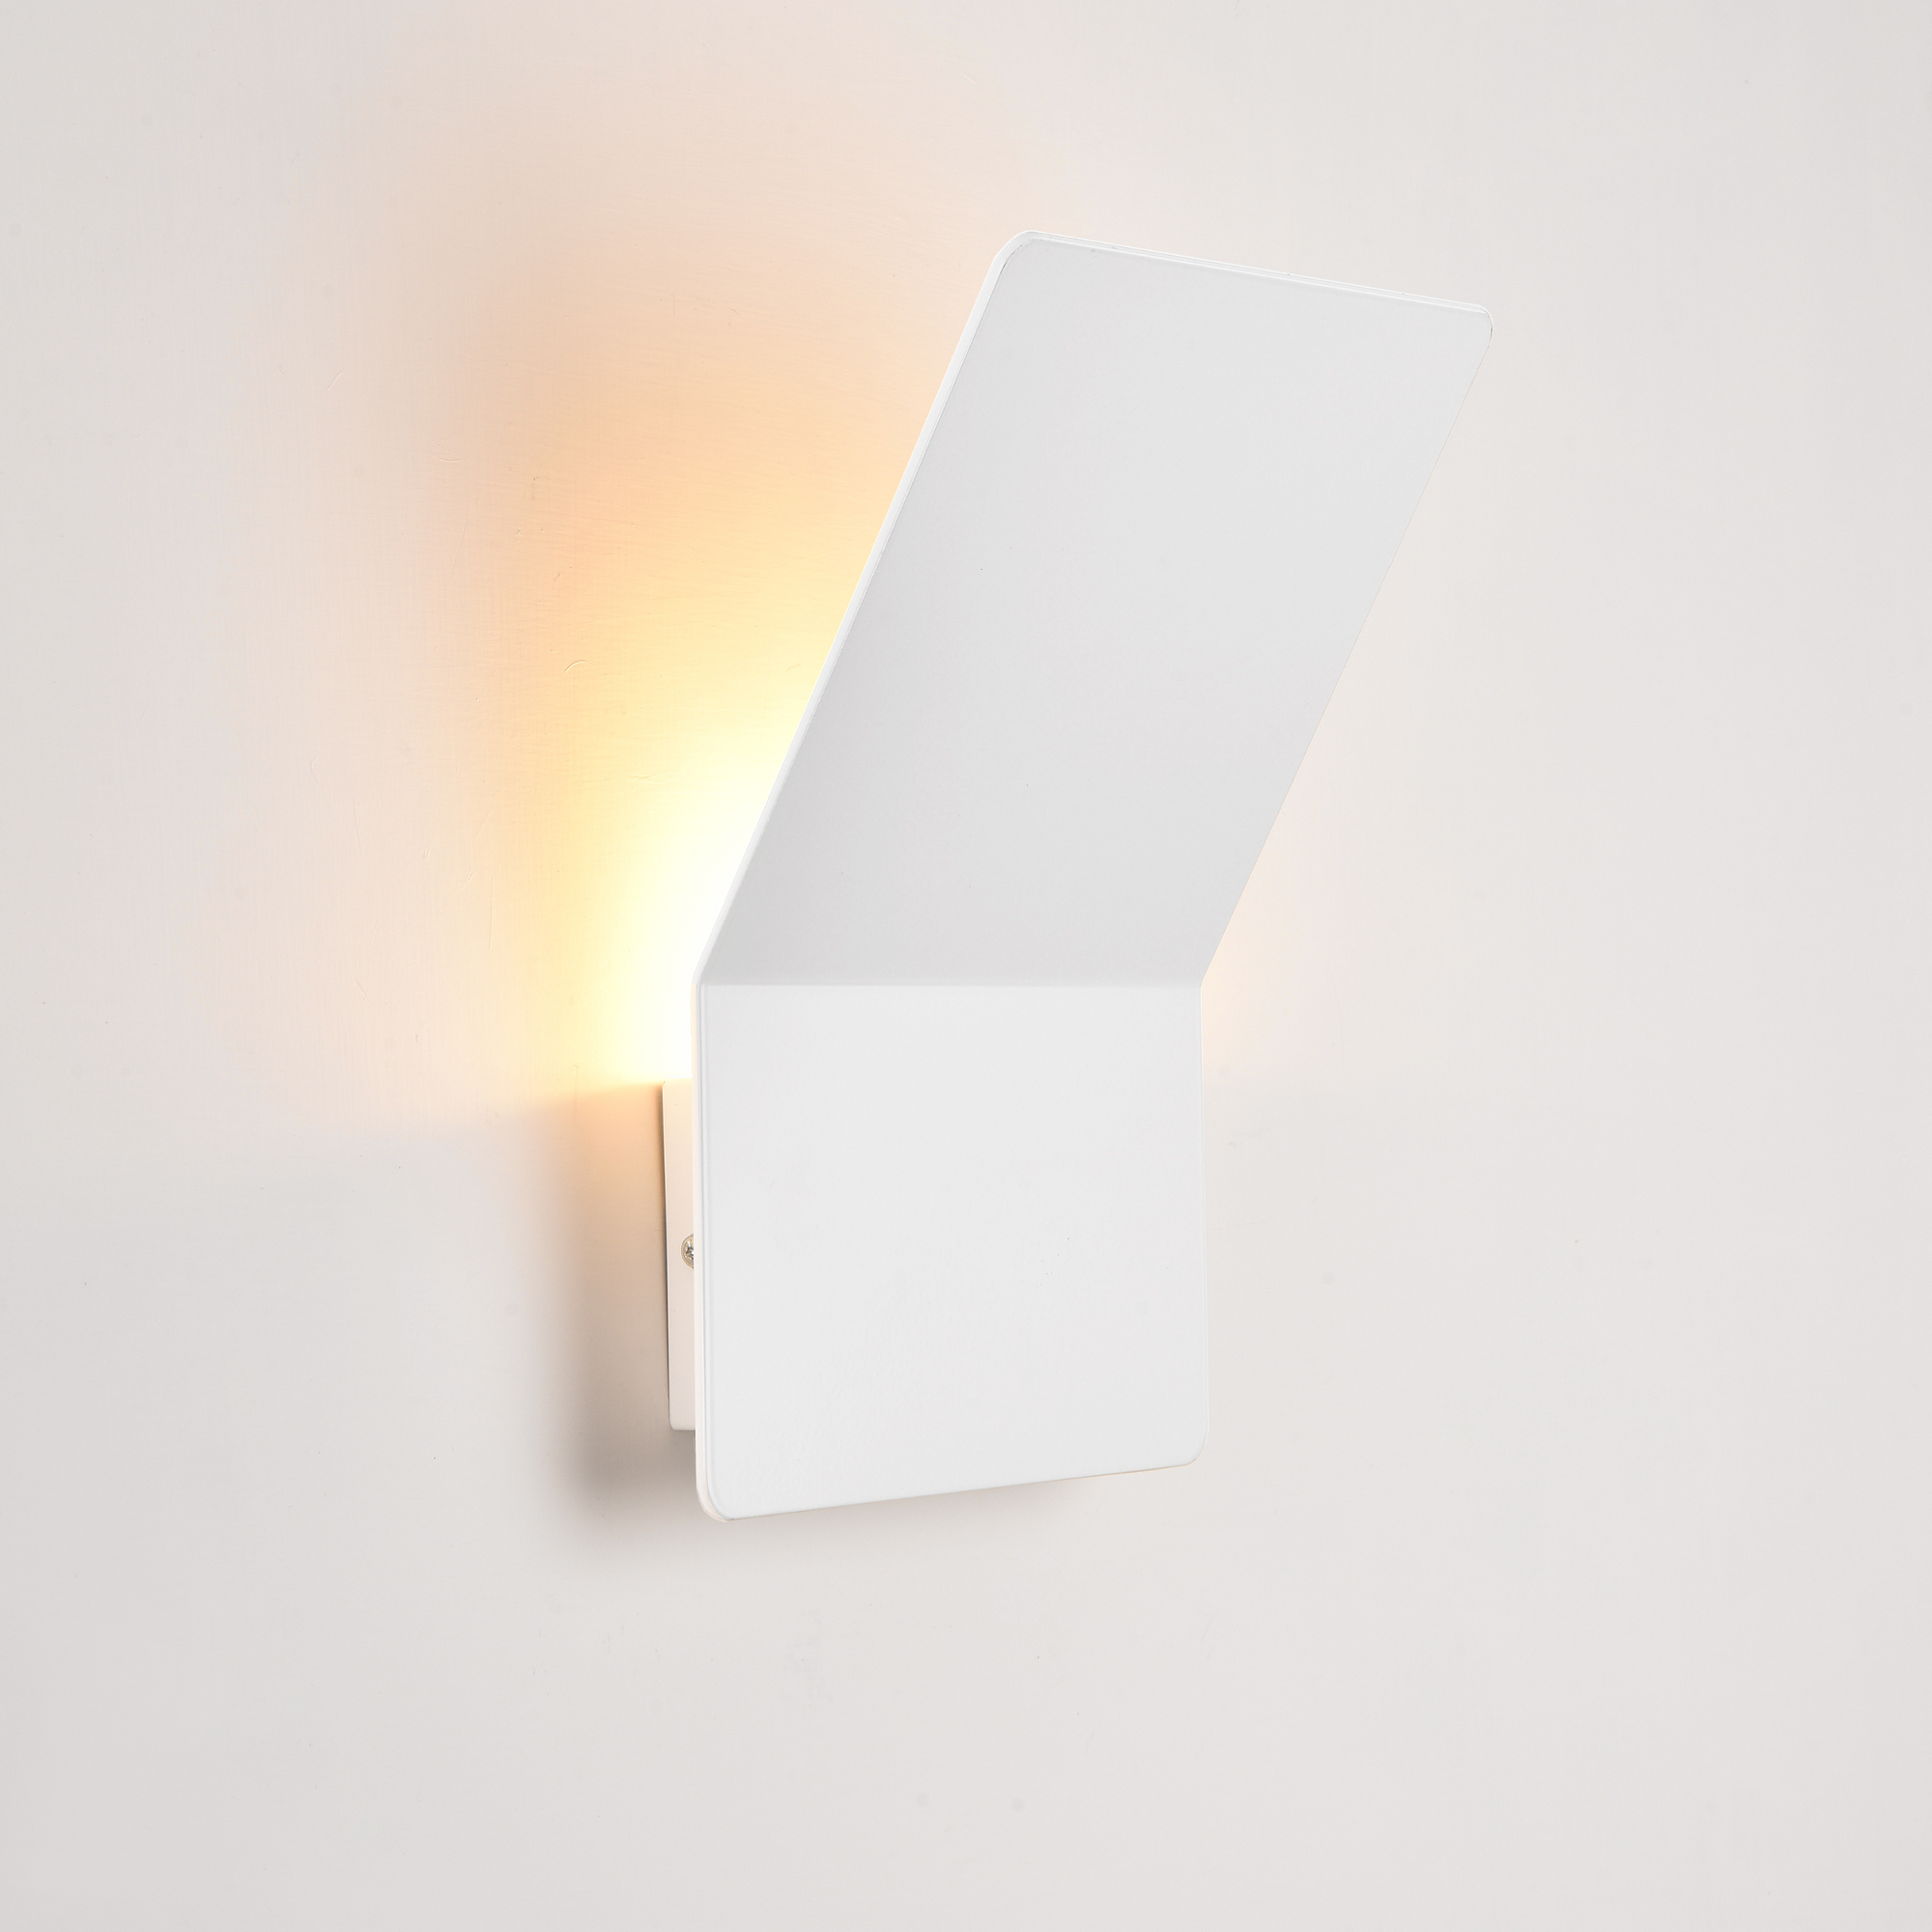 Wohnzimmerlampe Flurlampe Wandlampe modern Eckige Design LED Wandleuchte ALINE